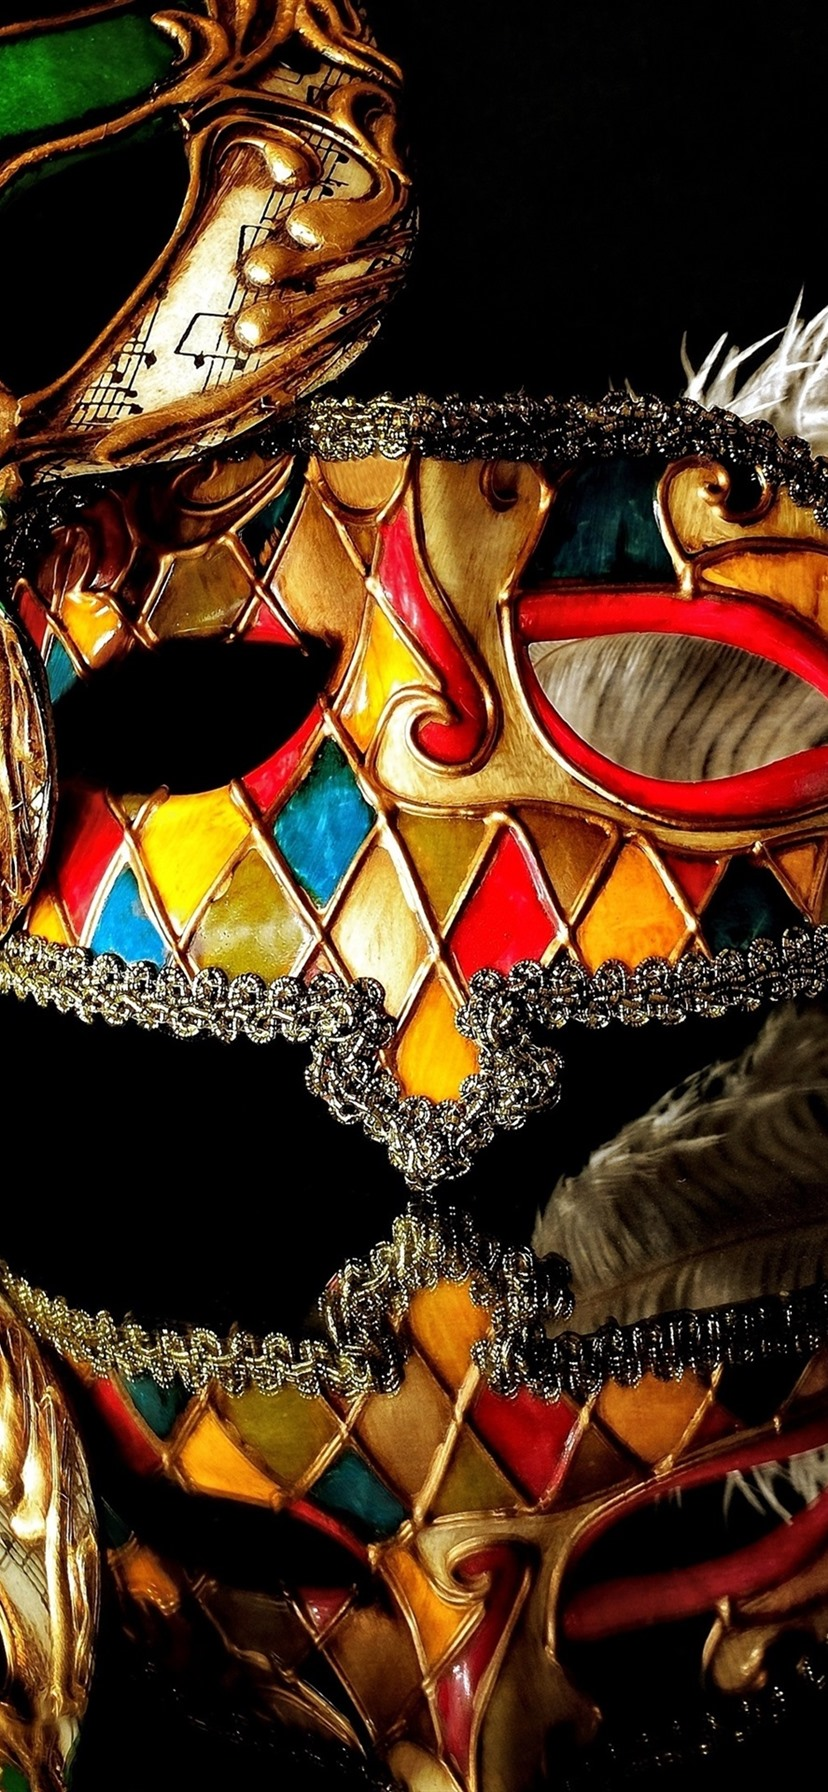 Wallpaper Carnival Mask Reflection Black Background 3840x2160 Uhd